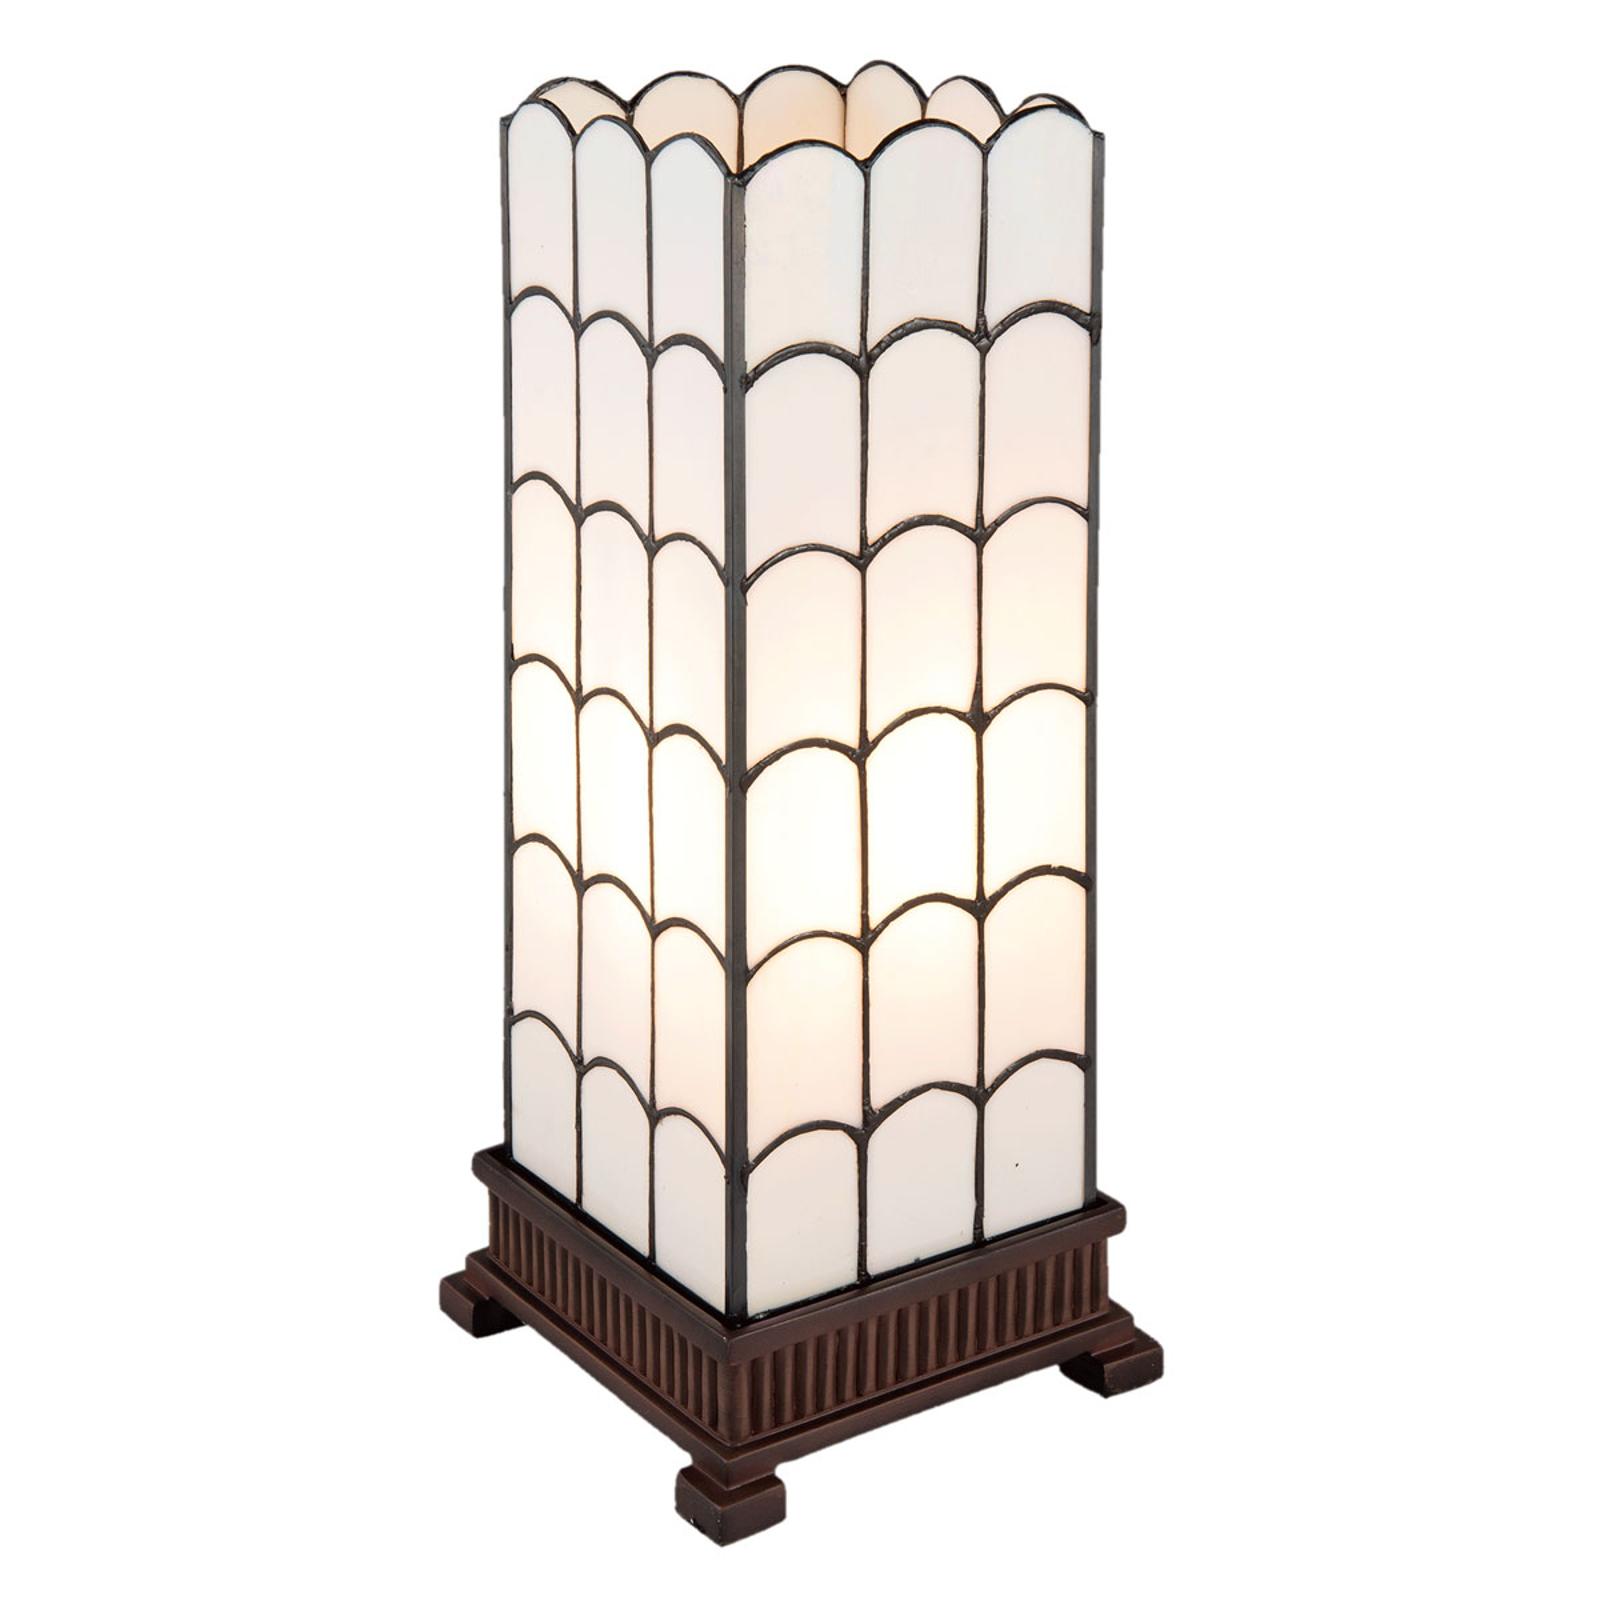 Tafellamp 5930 in wit, Tiffany-design, 45 cm